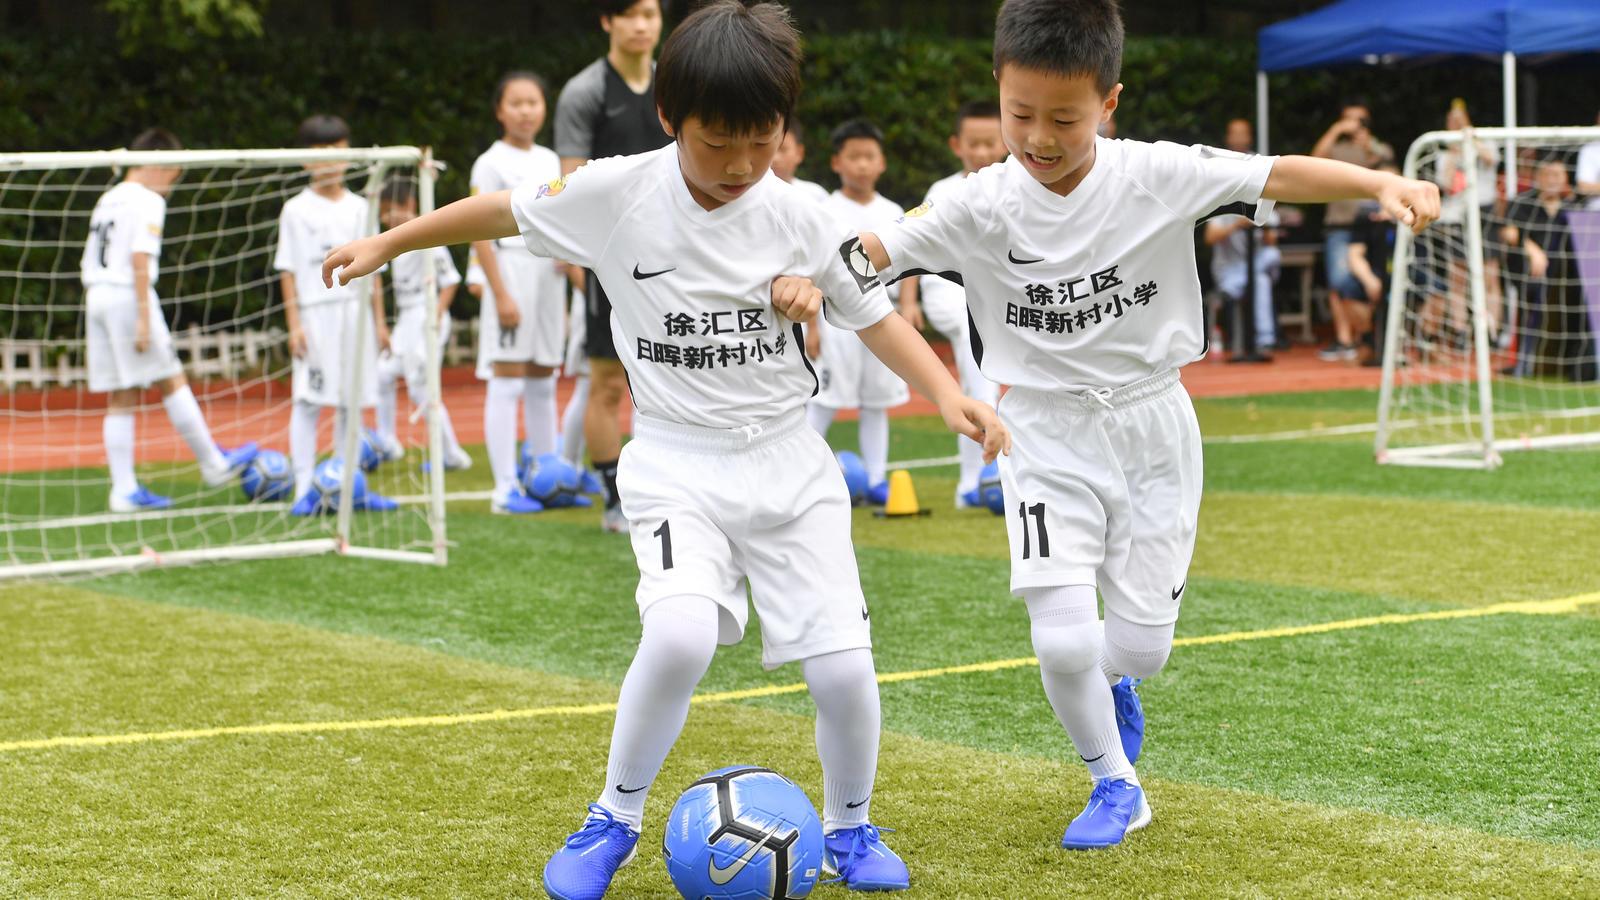 nike-and-tottenham-hotspur-shanghai-tour-2019